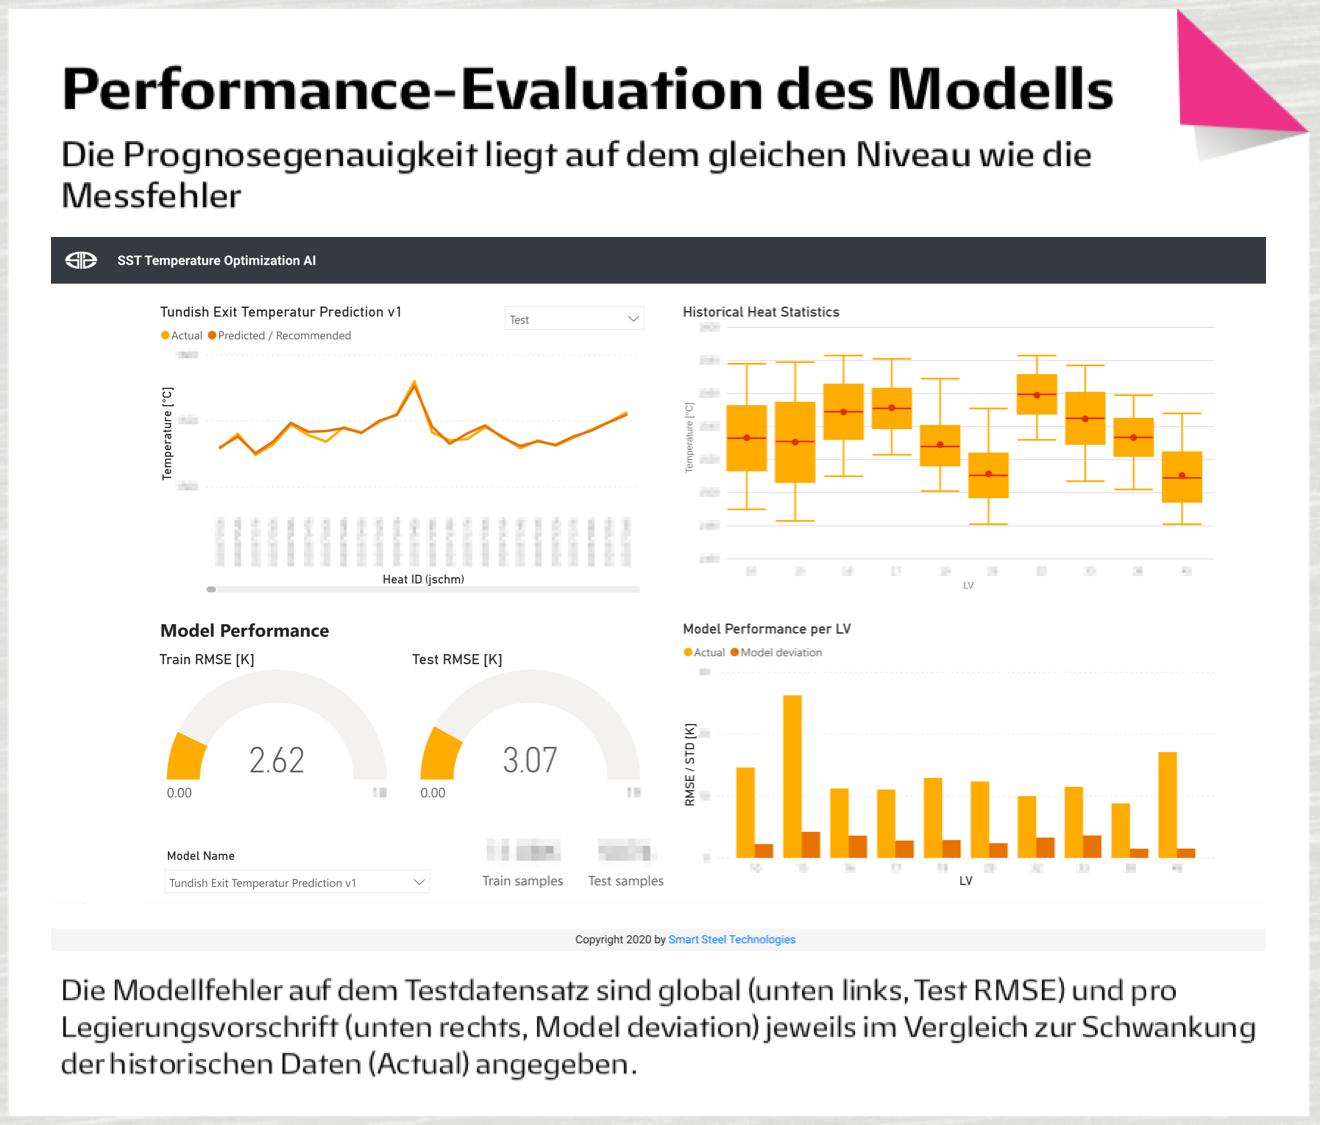 Performance-Evaluation des Modells